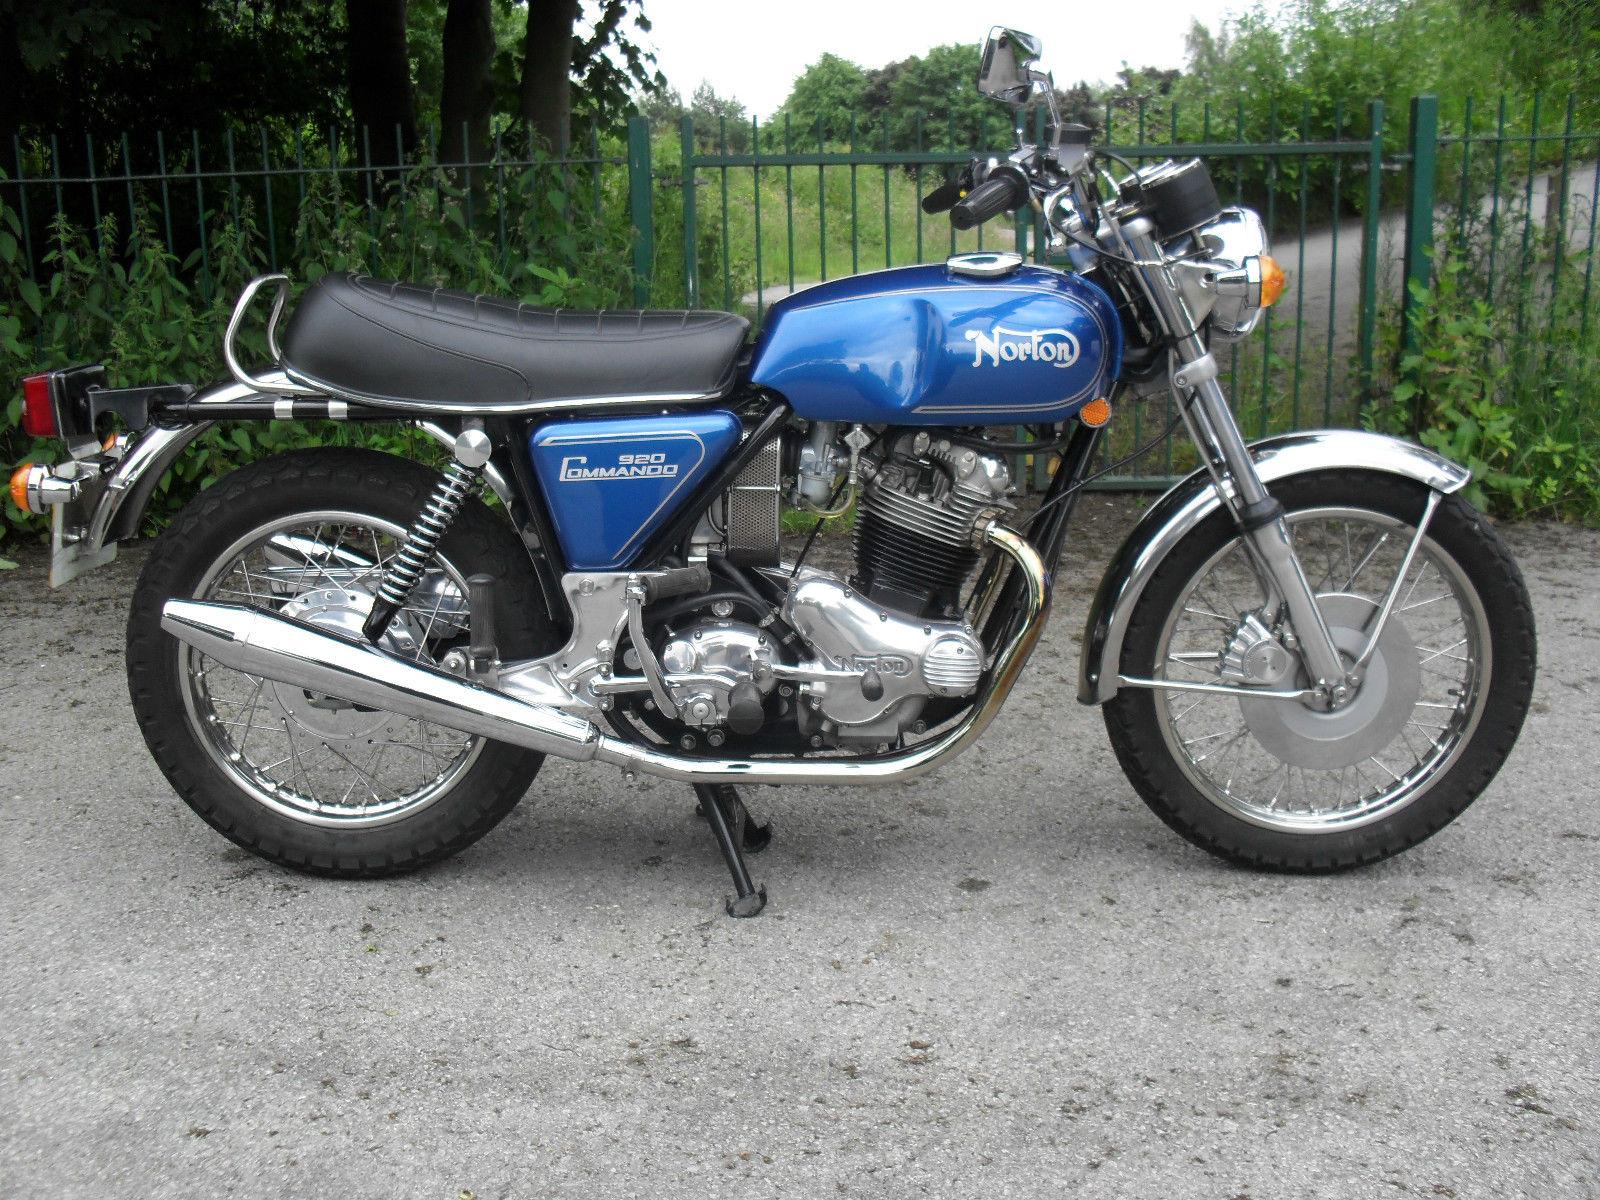 Restored Norton Commando 850 1974 Photographs At Classic Bikes Restored Bikes Restored